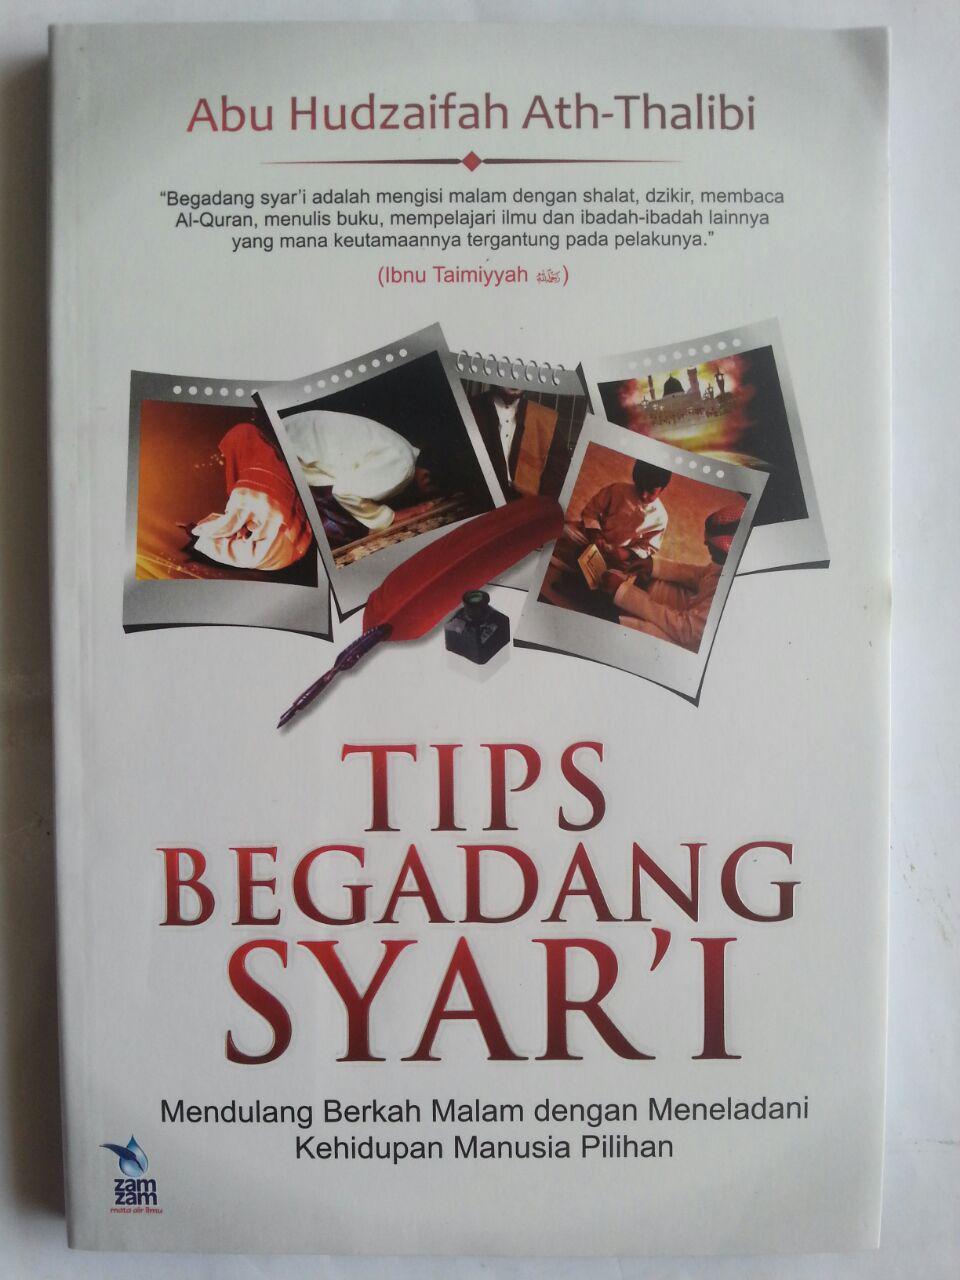 Buku Tips Begadang Syar'I Mendulang Berkah Malam cover 2